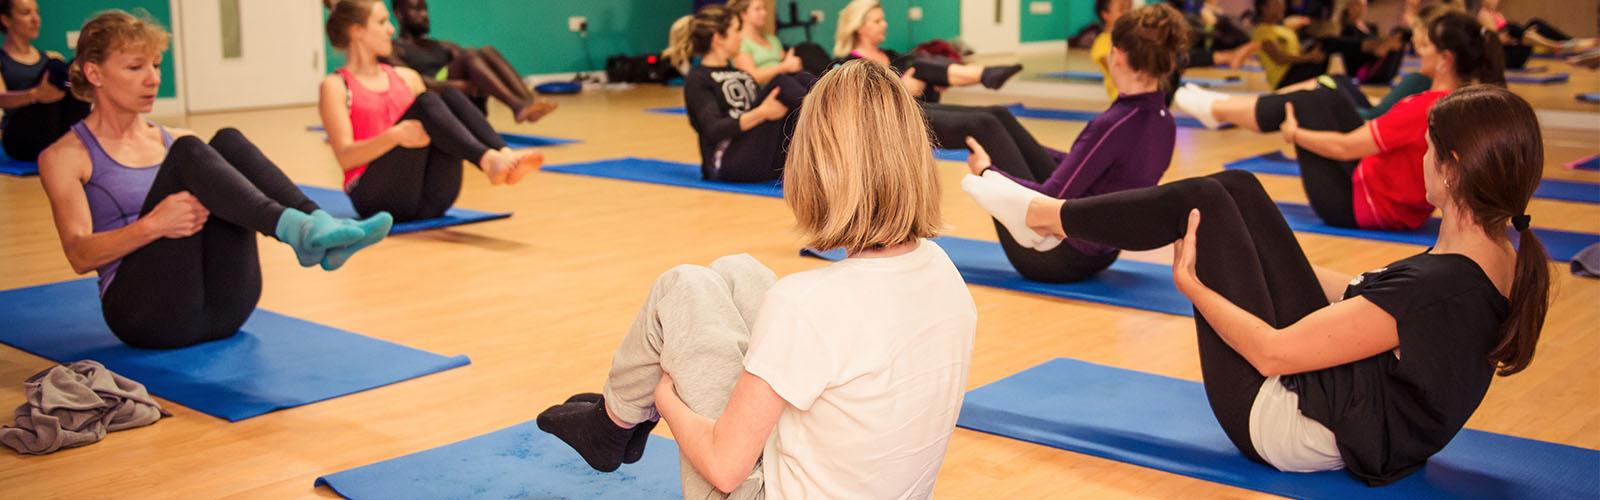 _0052_GOMammoth-Pilates-London